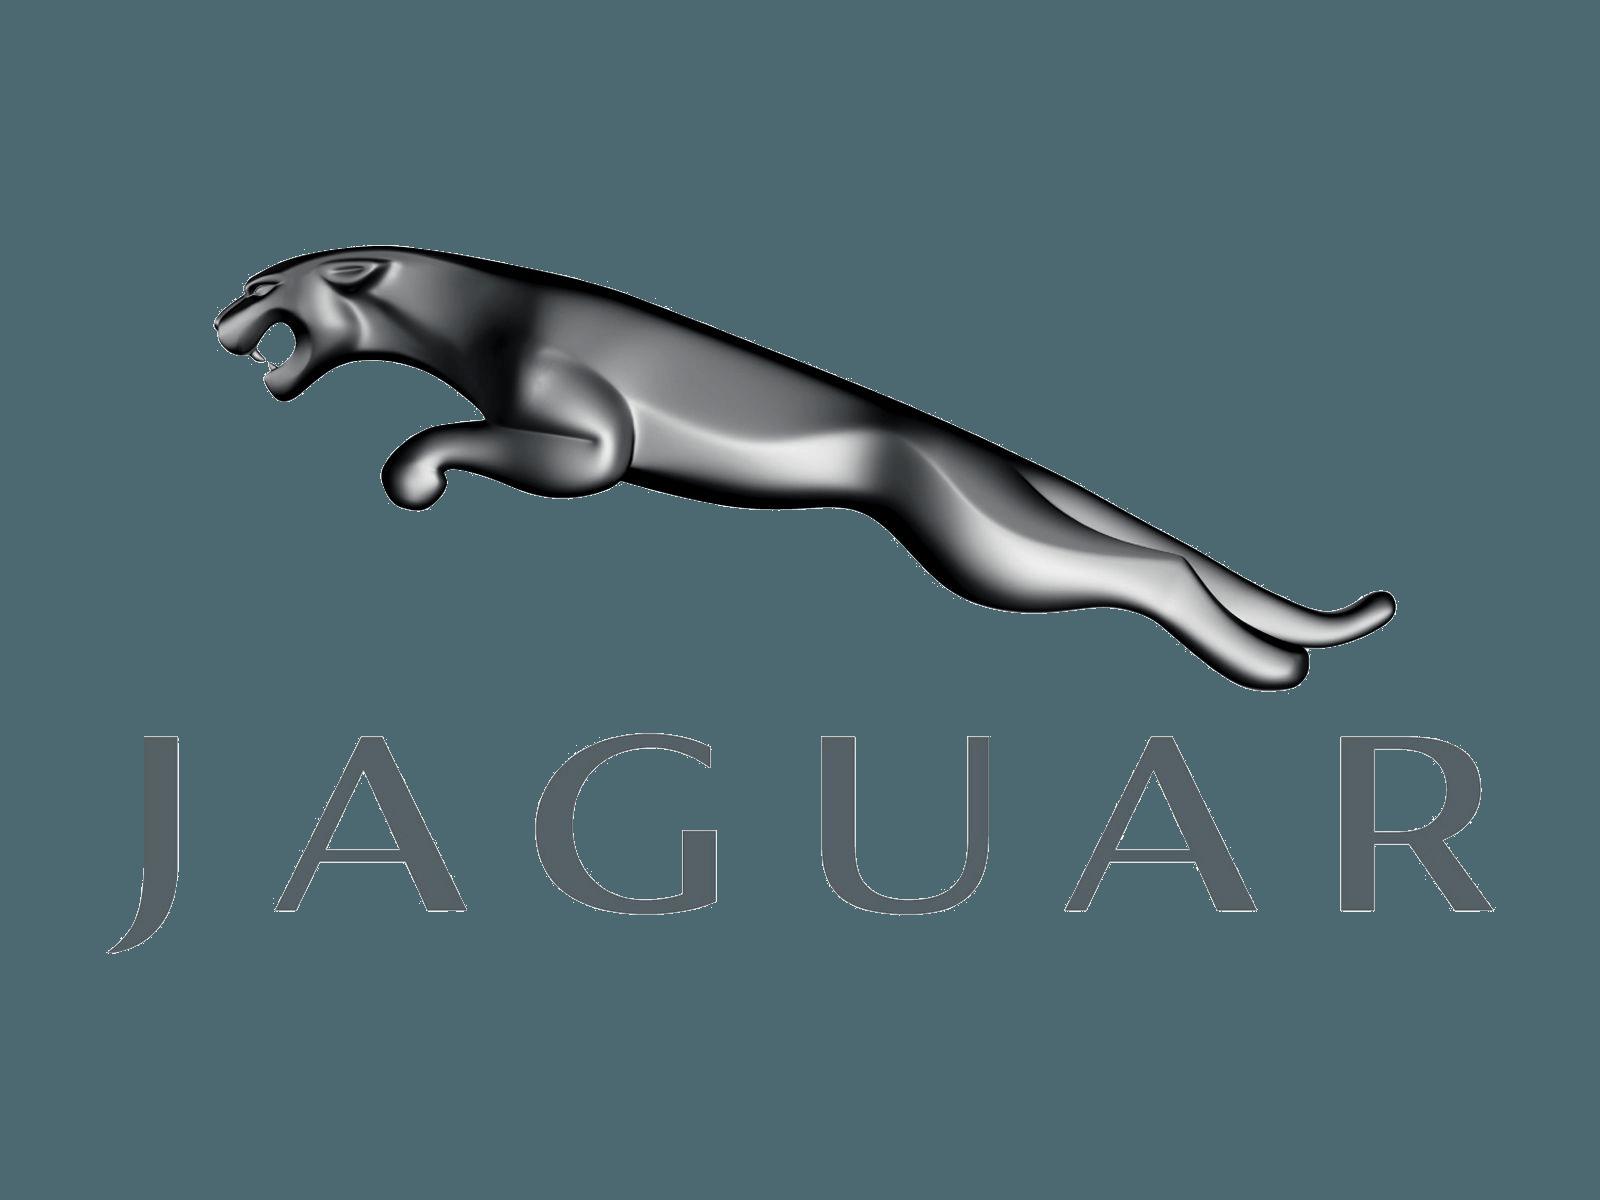 Jaguar Car Logo Png Brand Image PNG Image - Car Logo PNG